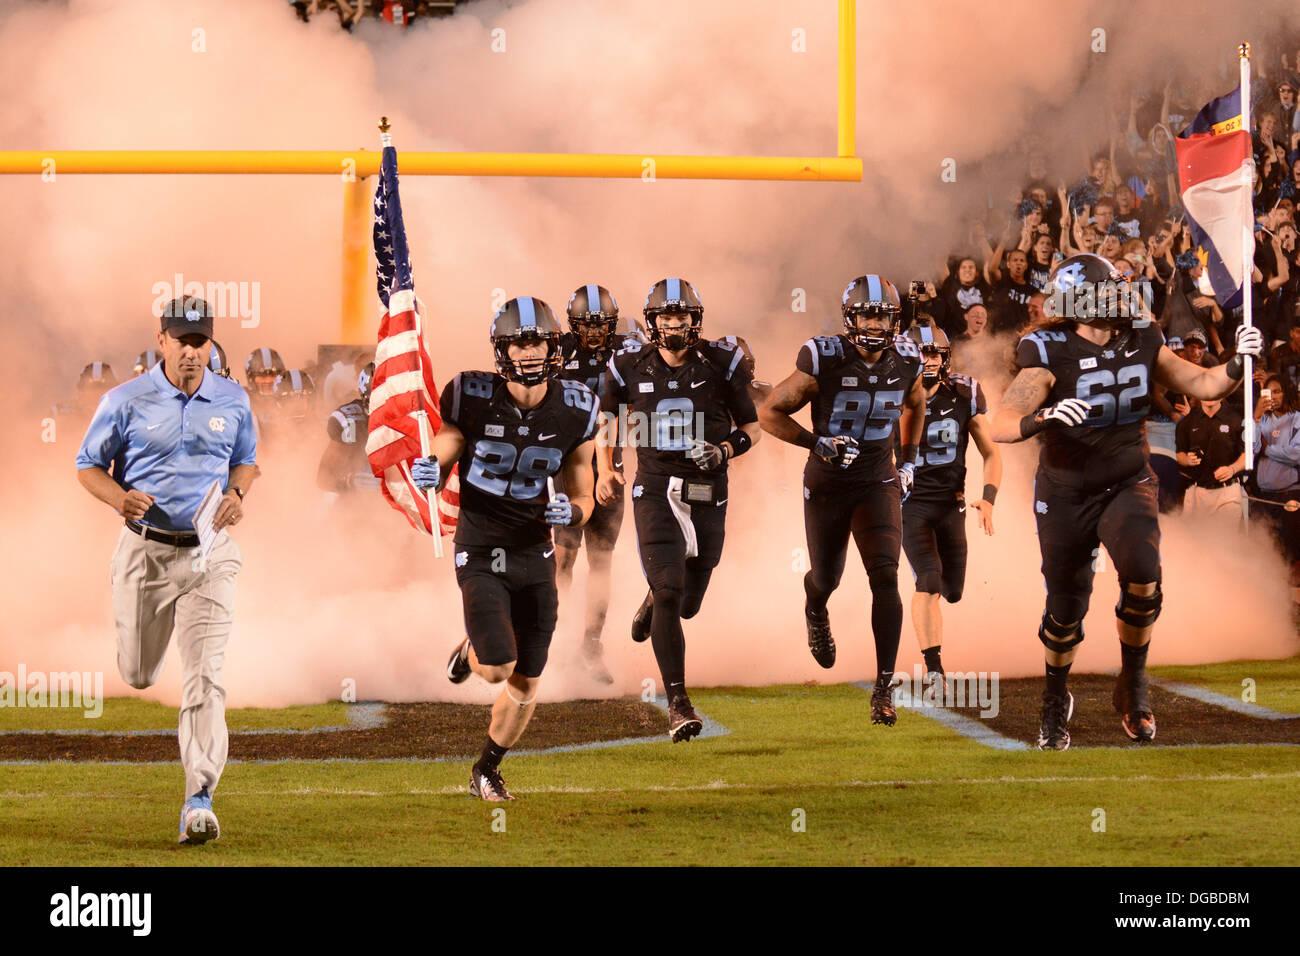 Chapel Hill, NC, USA. 17th Oct, 2013. October 17, 2013: North Carolina takes the field before the NCAA Football Stock Photo